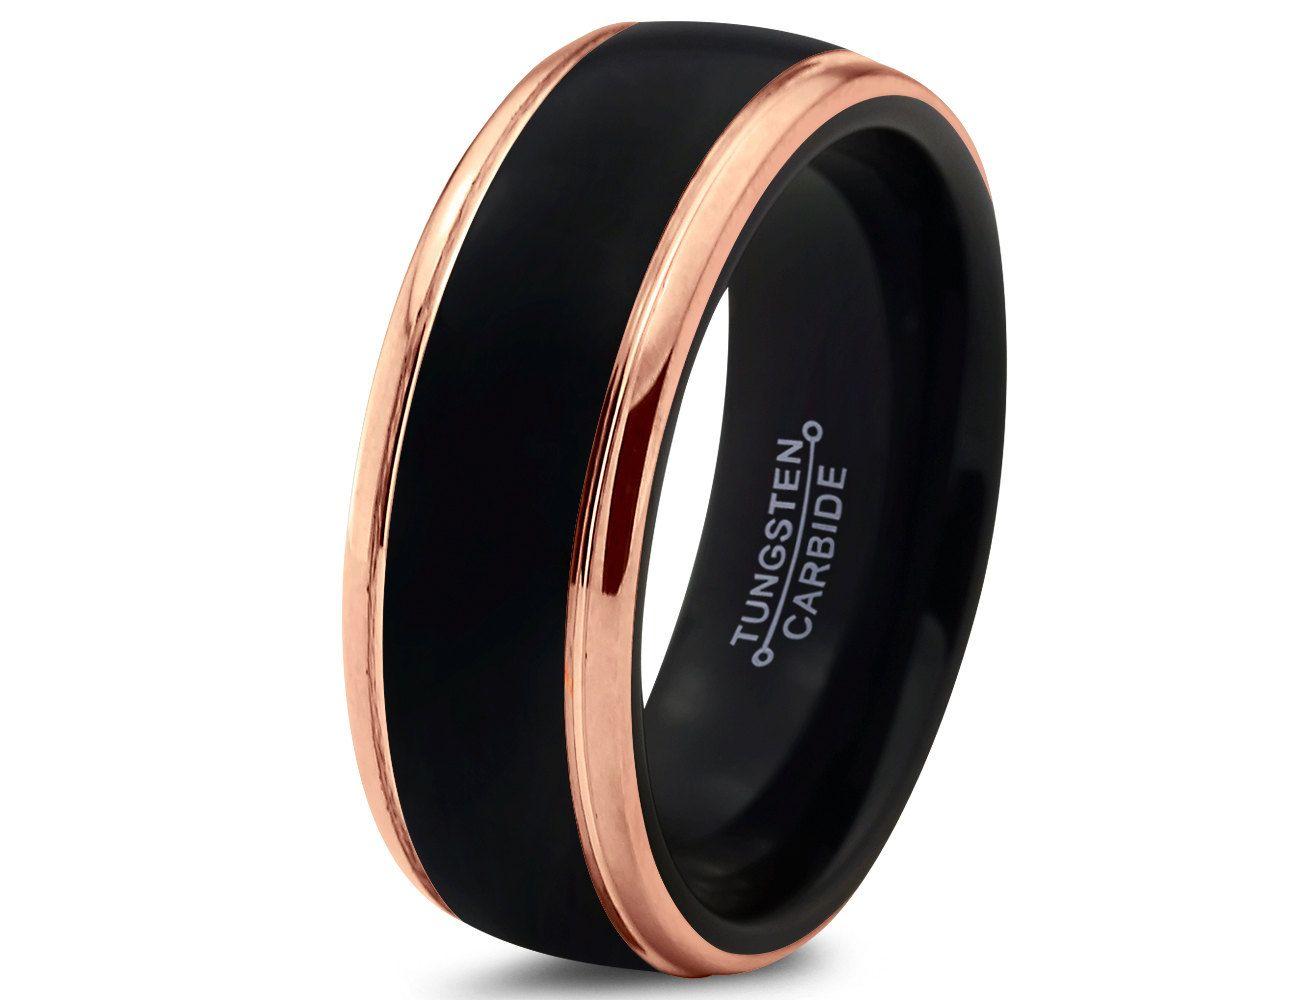 mens black wedding rings Black Tungsten Ring Rose Gold Wedding Band Ring Tungsten Carbide 8mm 18K Tungsten Ring Man Wedding